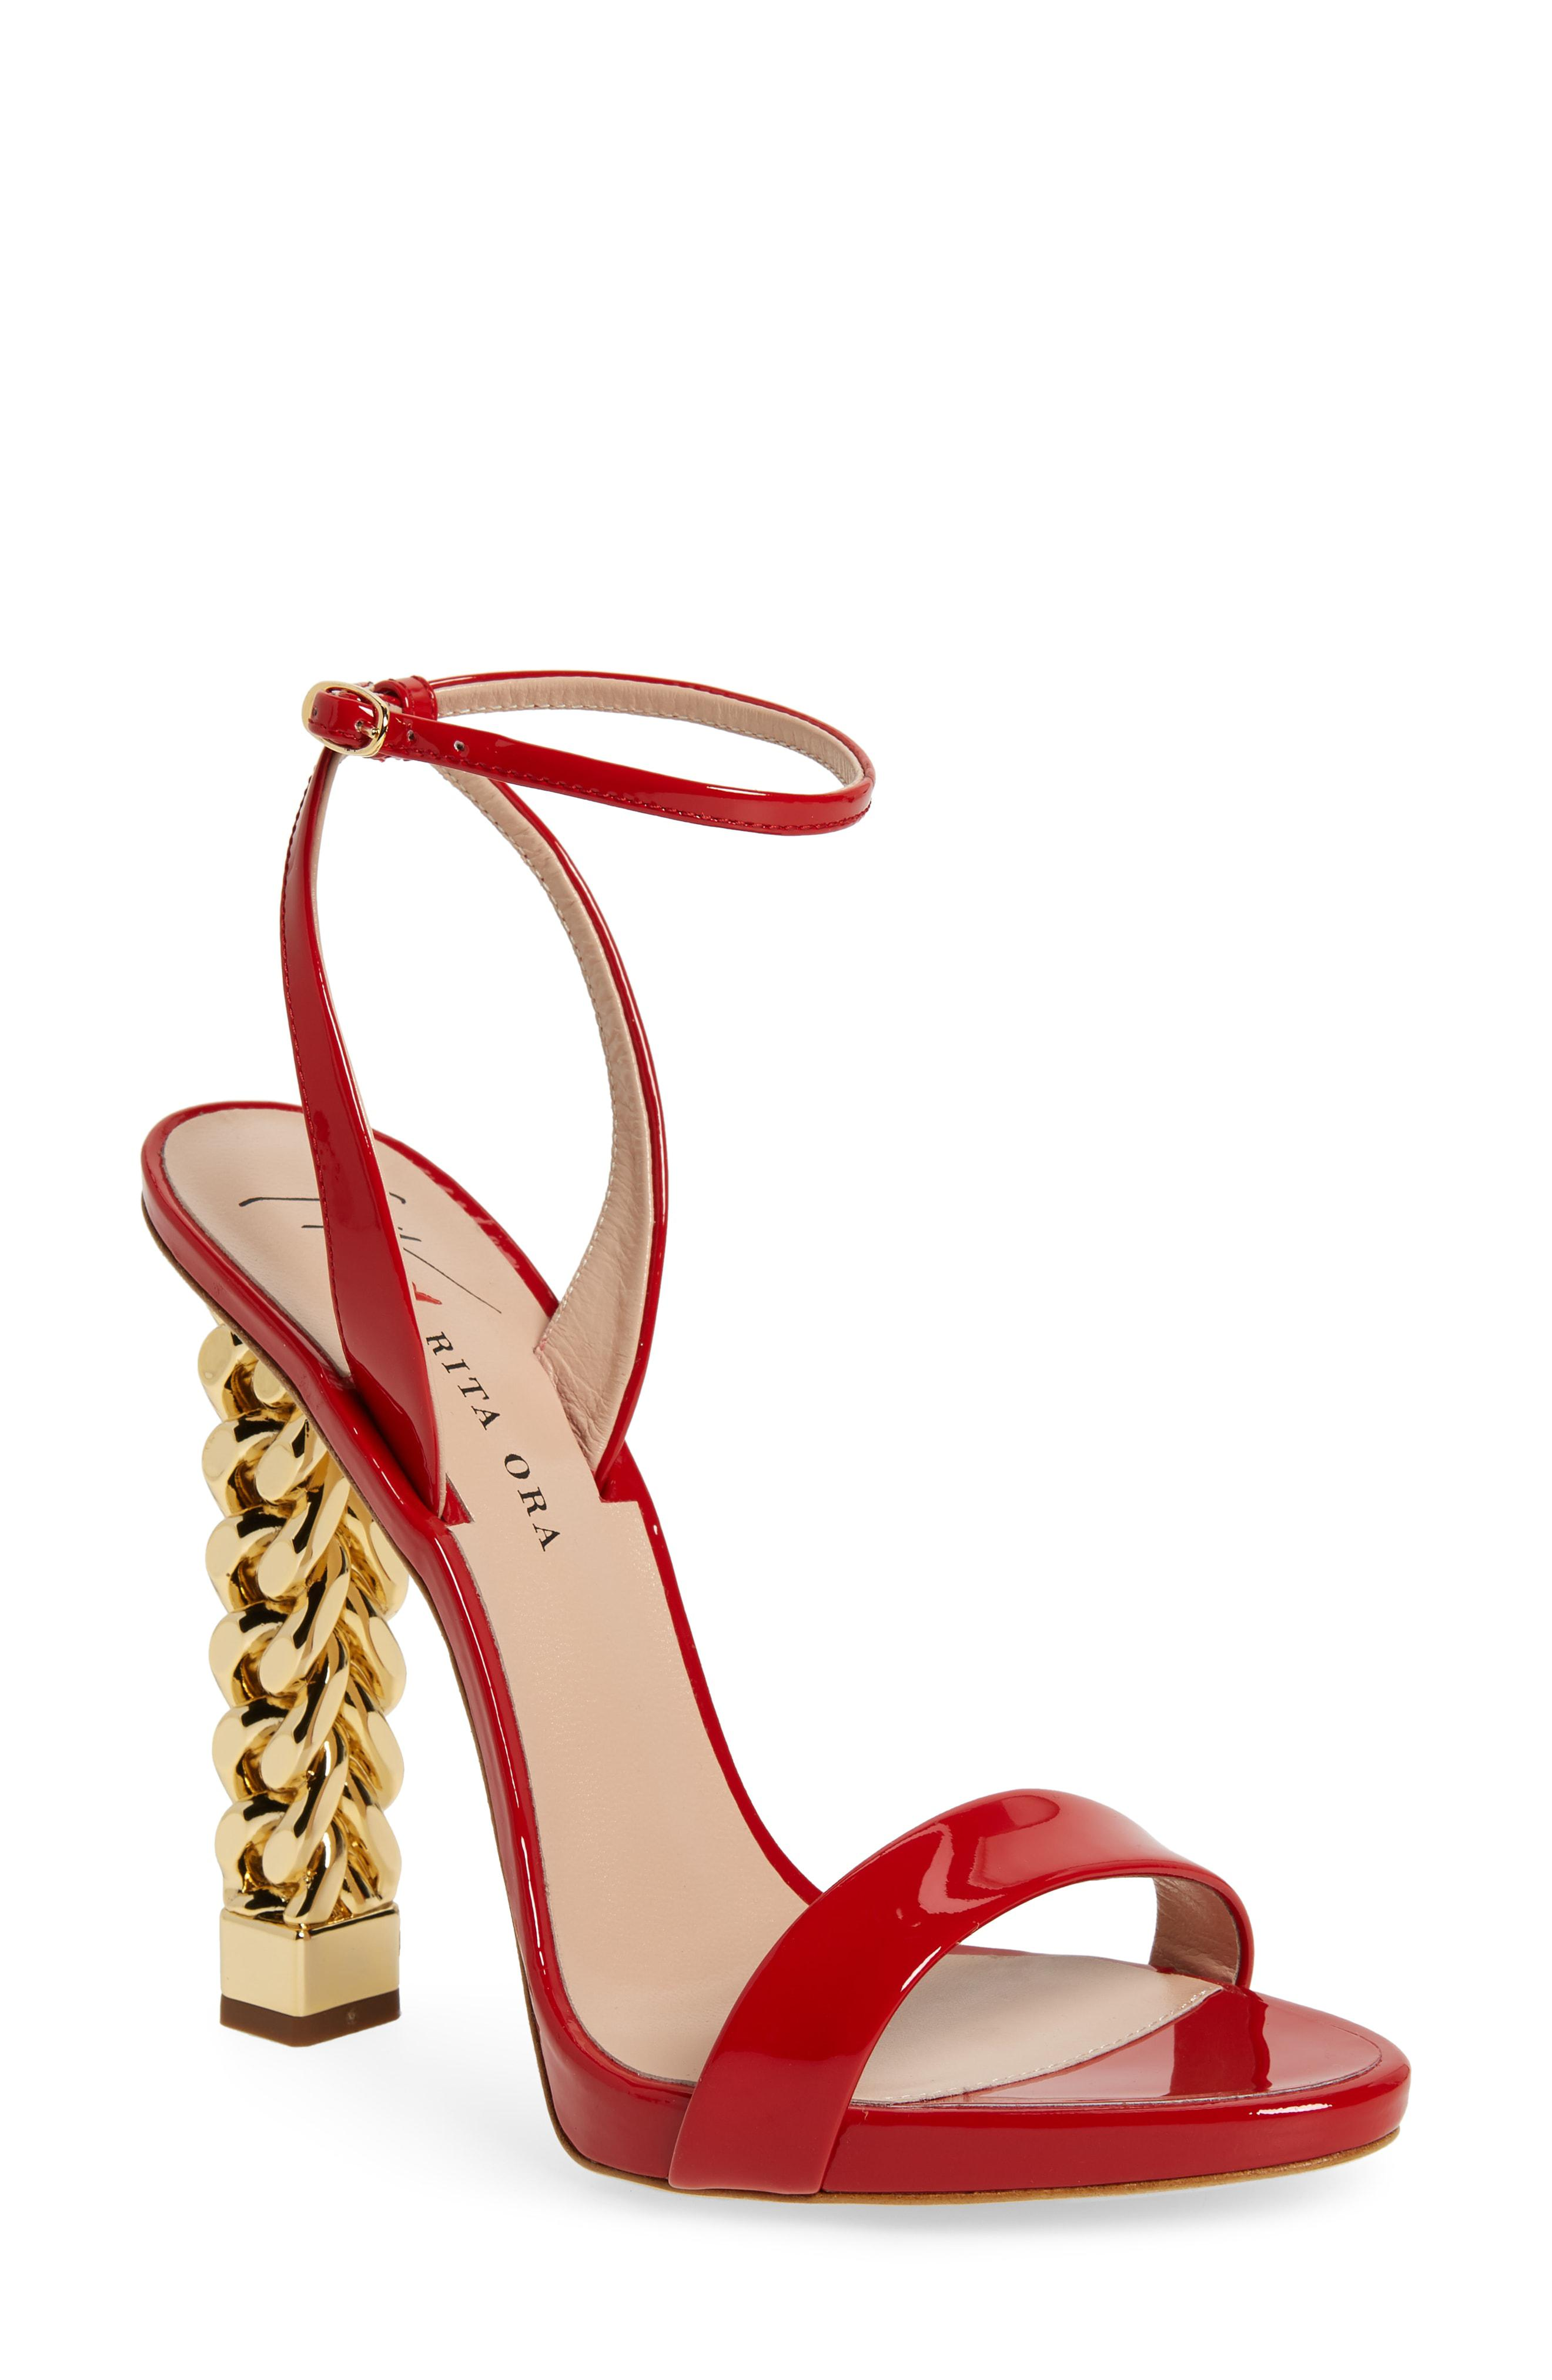 c7836b76e08 Giuseppe Zanotti X Rita Ora Chain Heel Sandal in Red - Lyst